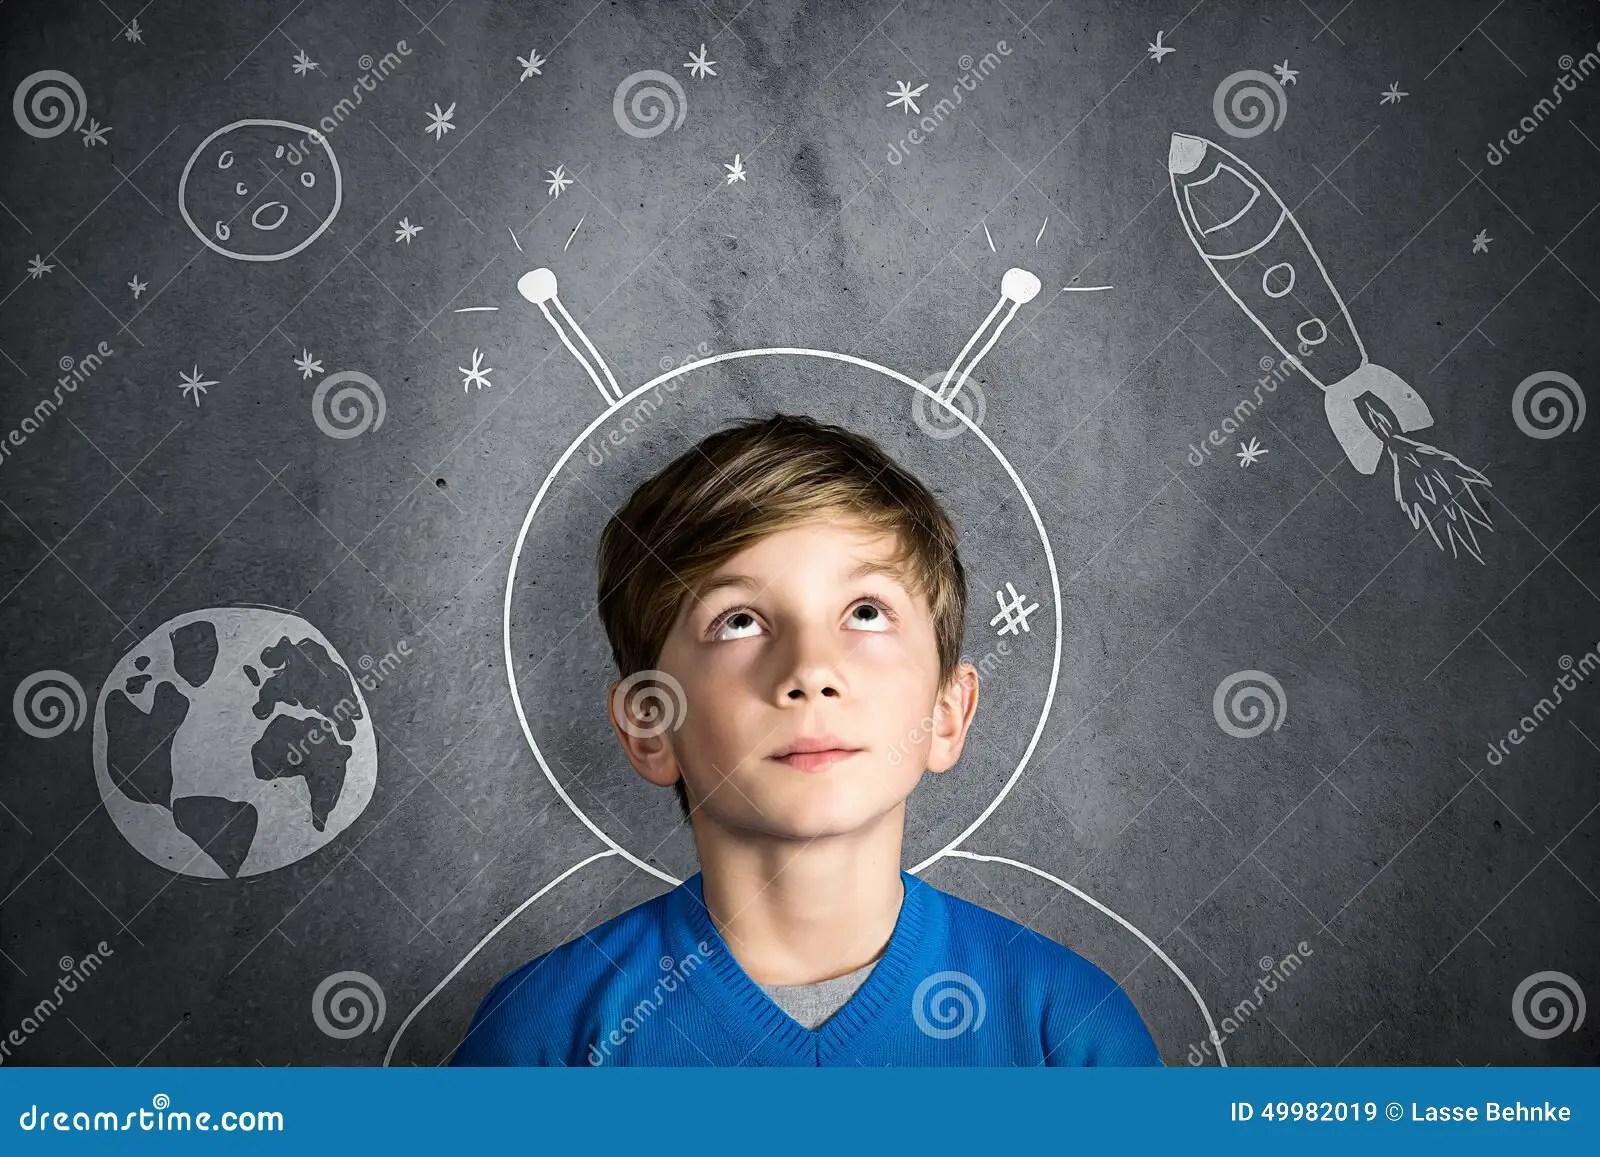 Childhood Dreams Stock Illustration Image 49982019